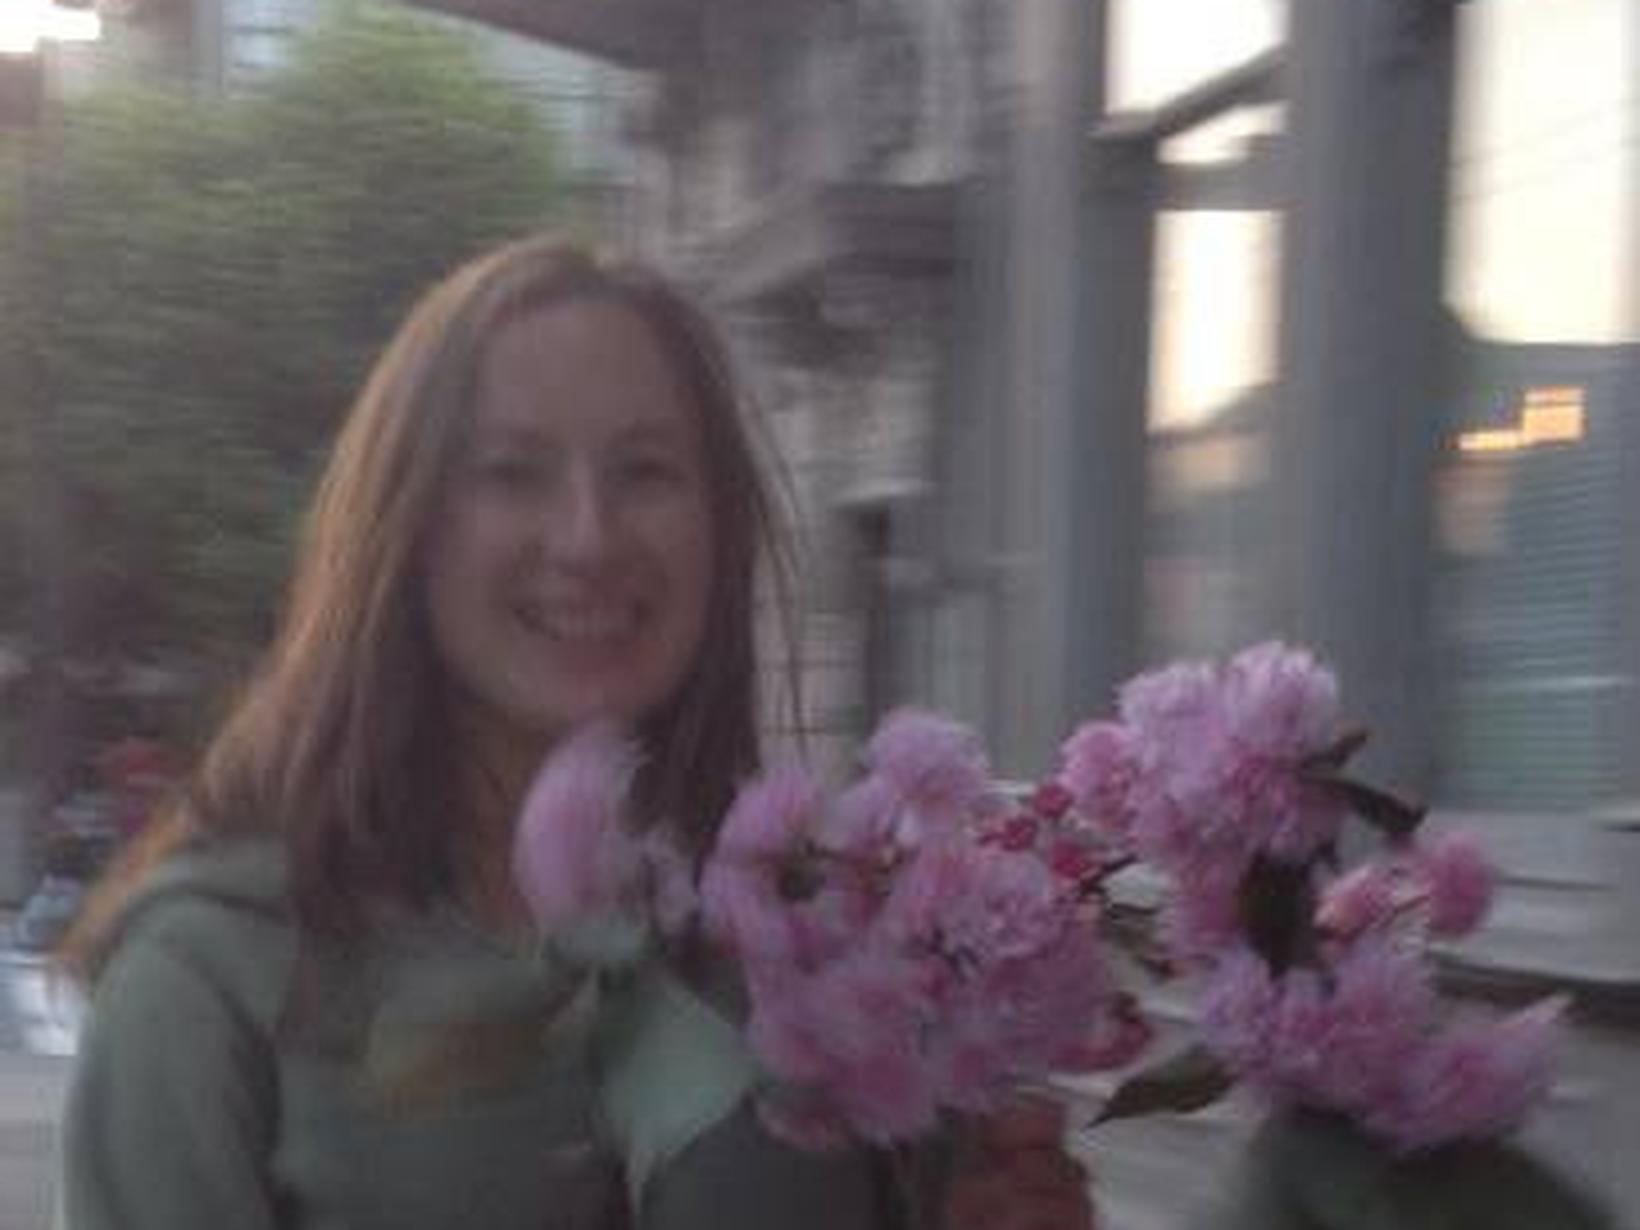 Sylvie from San Francisco, California, United States